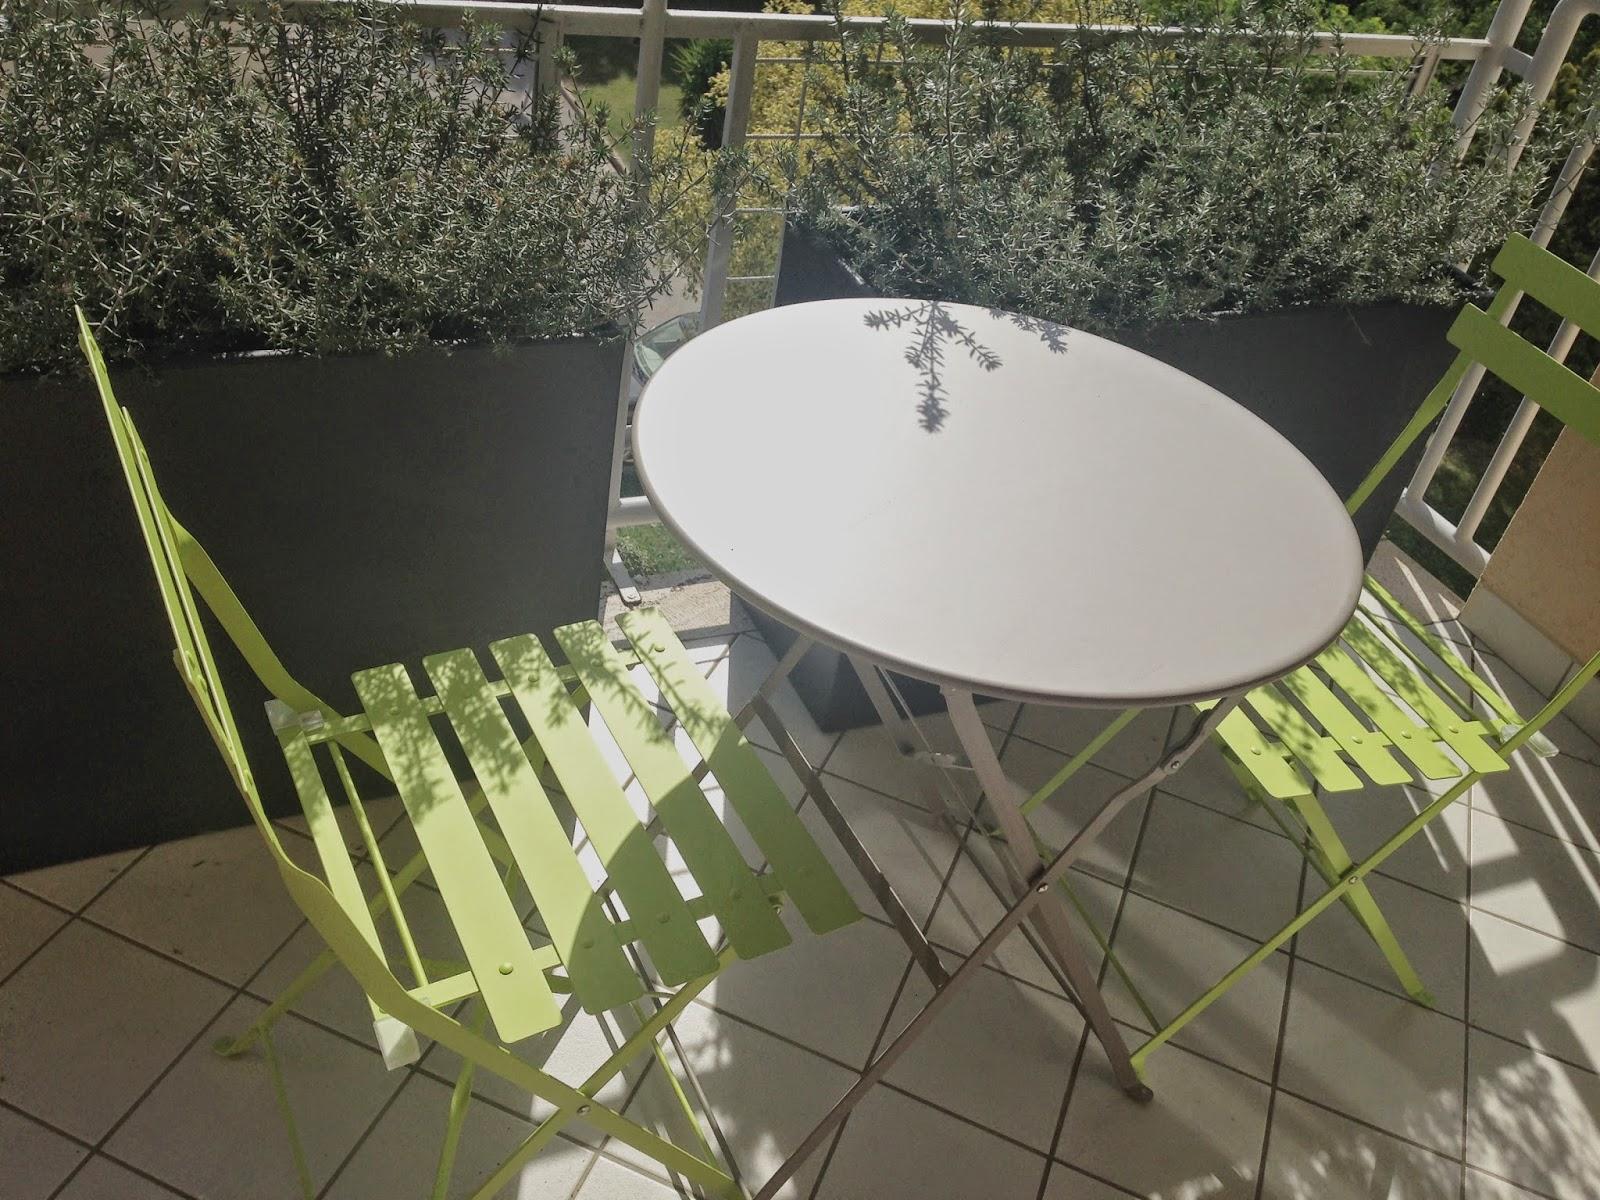 Tavoli Da Giardino Maison Du Monde.Sedie Da Giardino Maison Du Monde Copridivano Con Chaise Longue